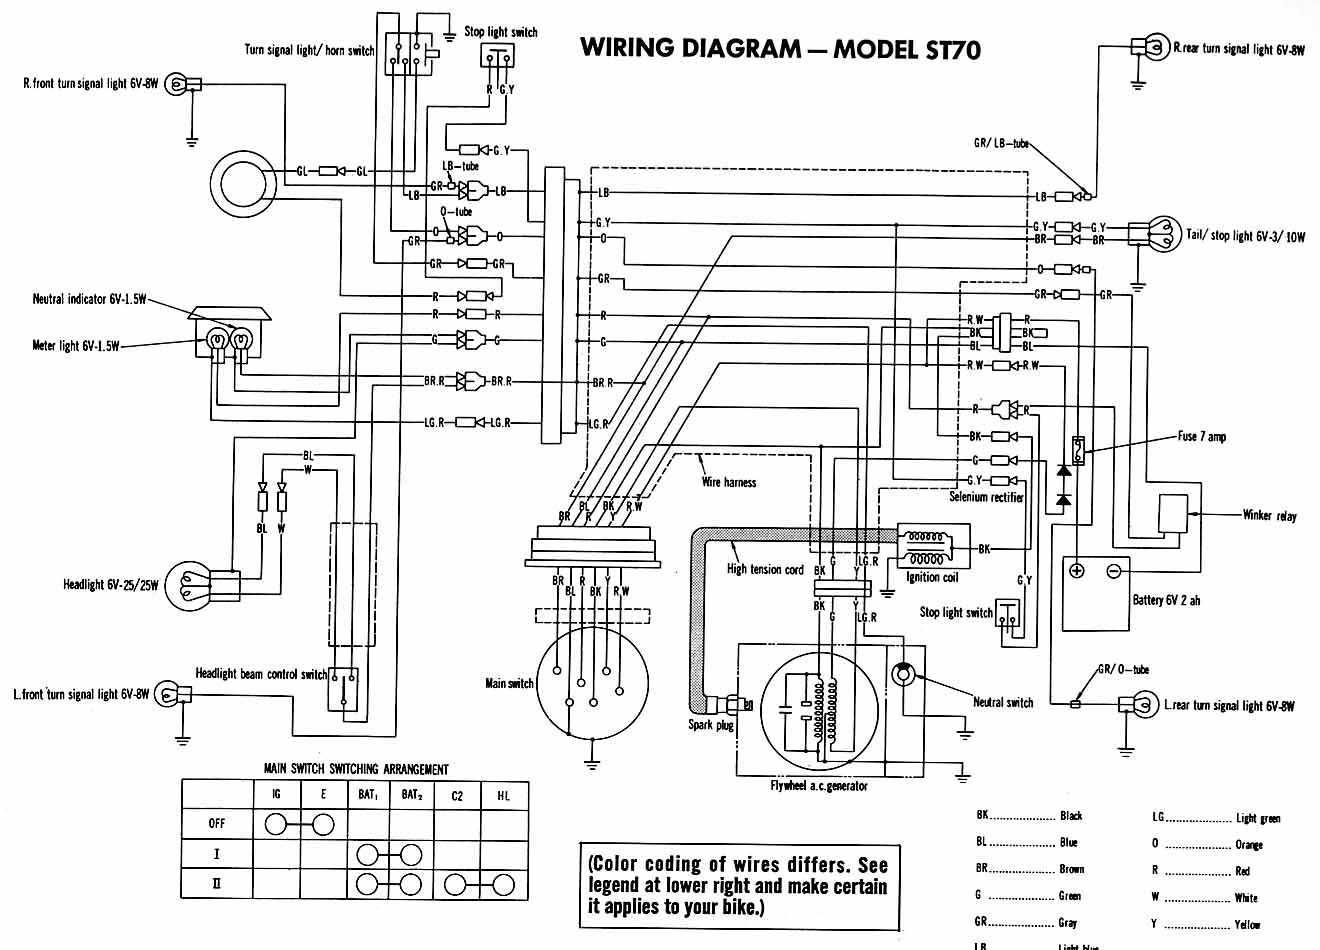 honda cd 70 motorcycle wiring diagram 28 images 5 honda ct70 rh ys5bg us